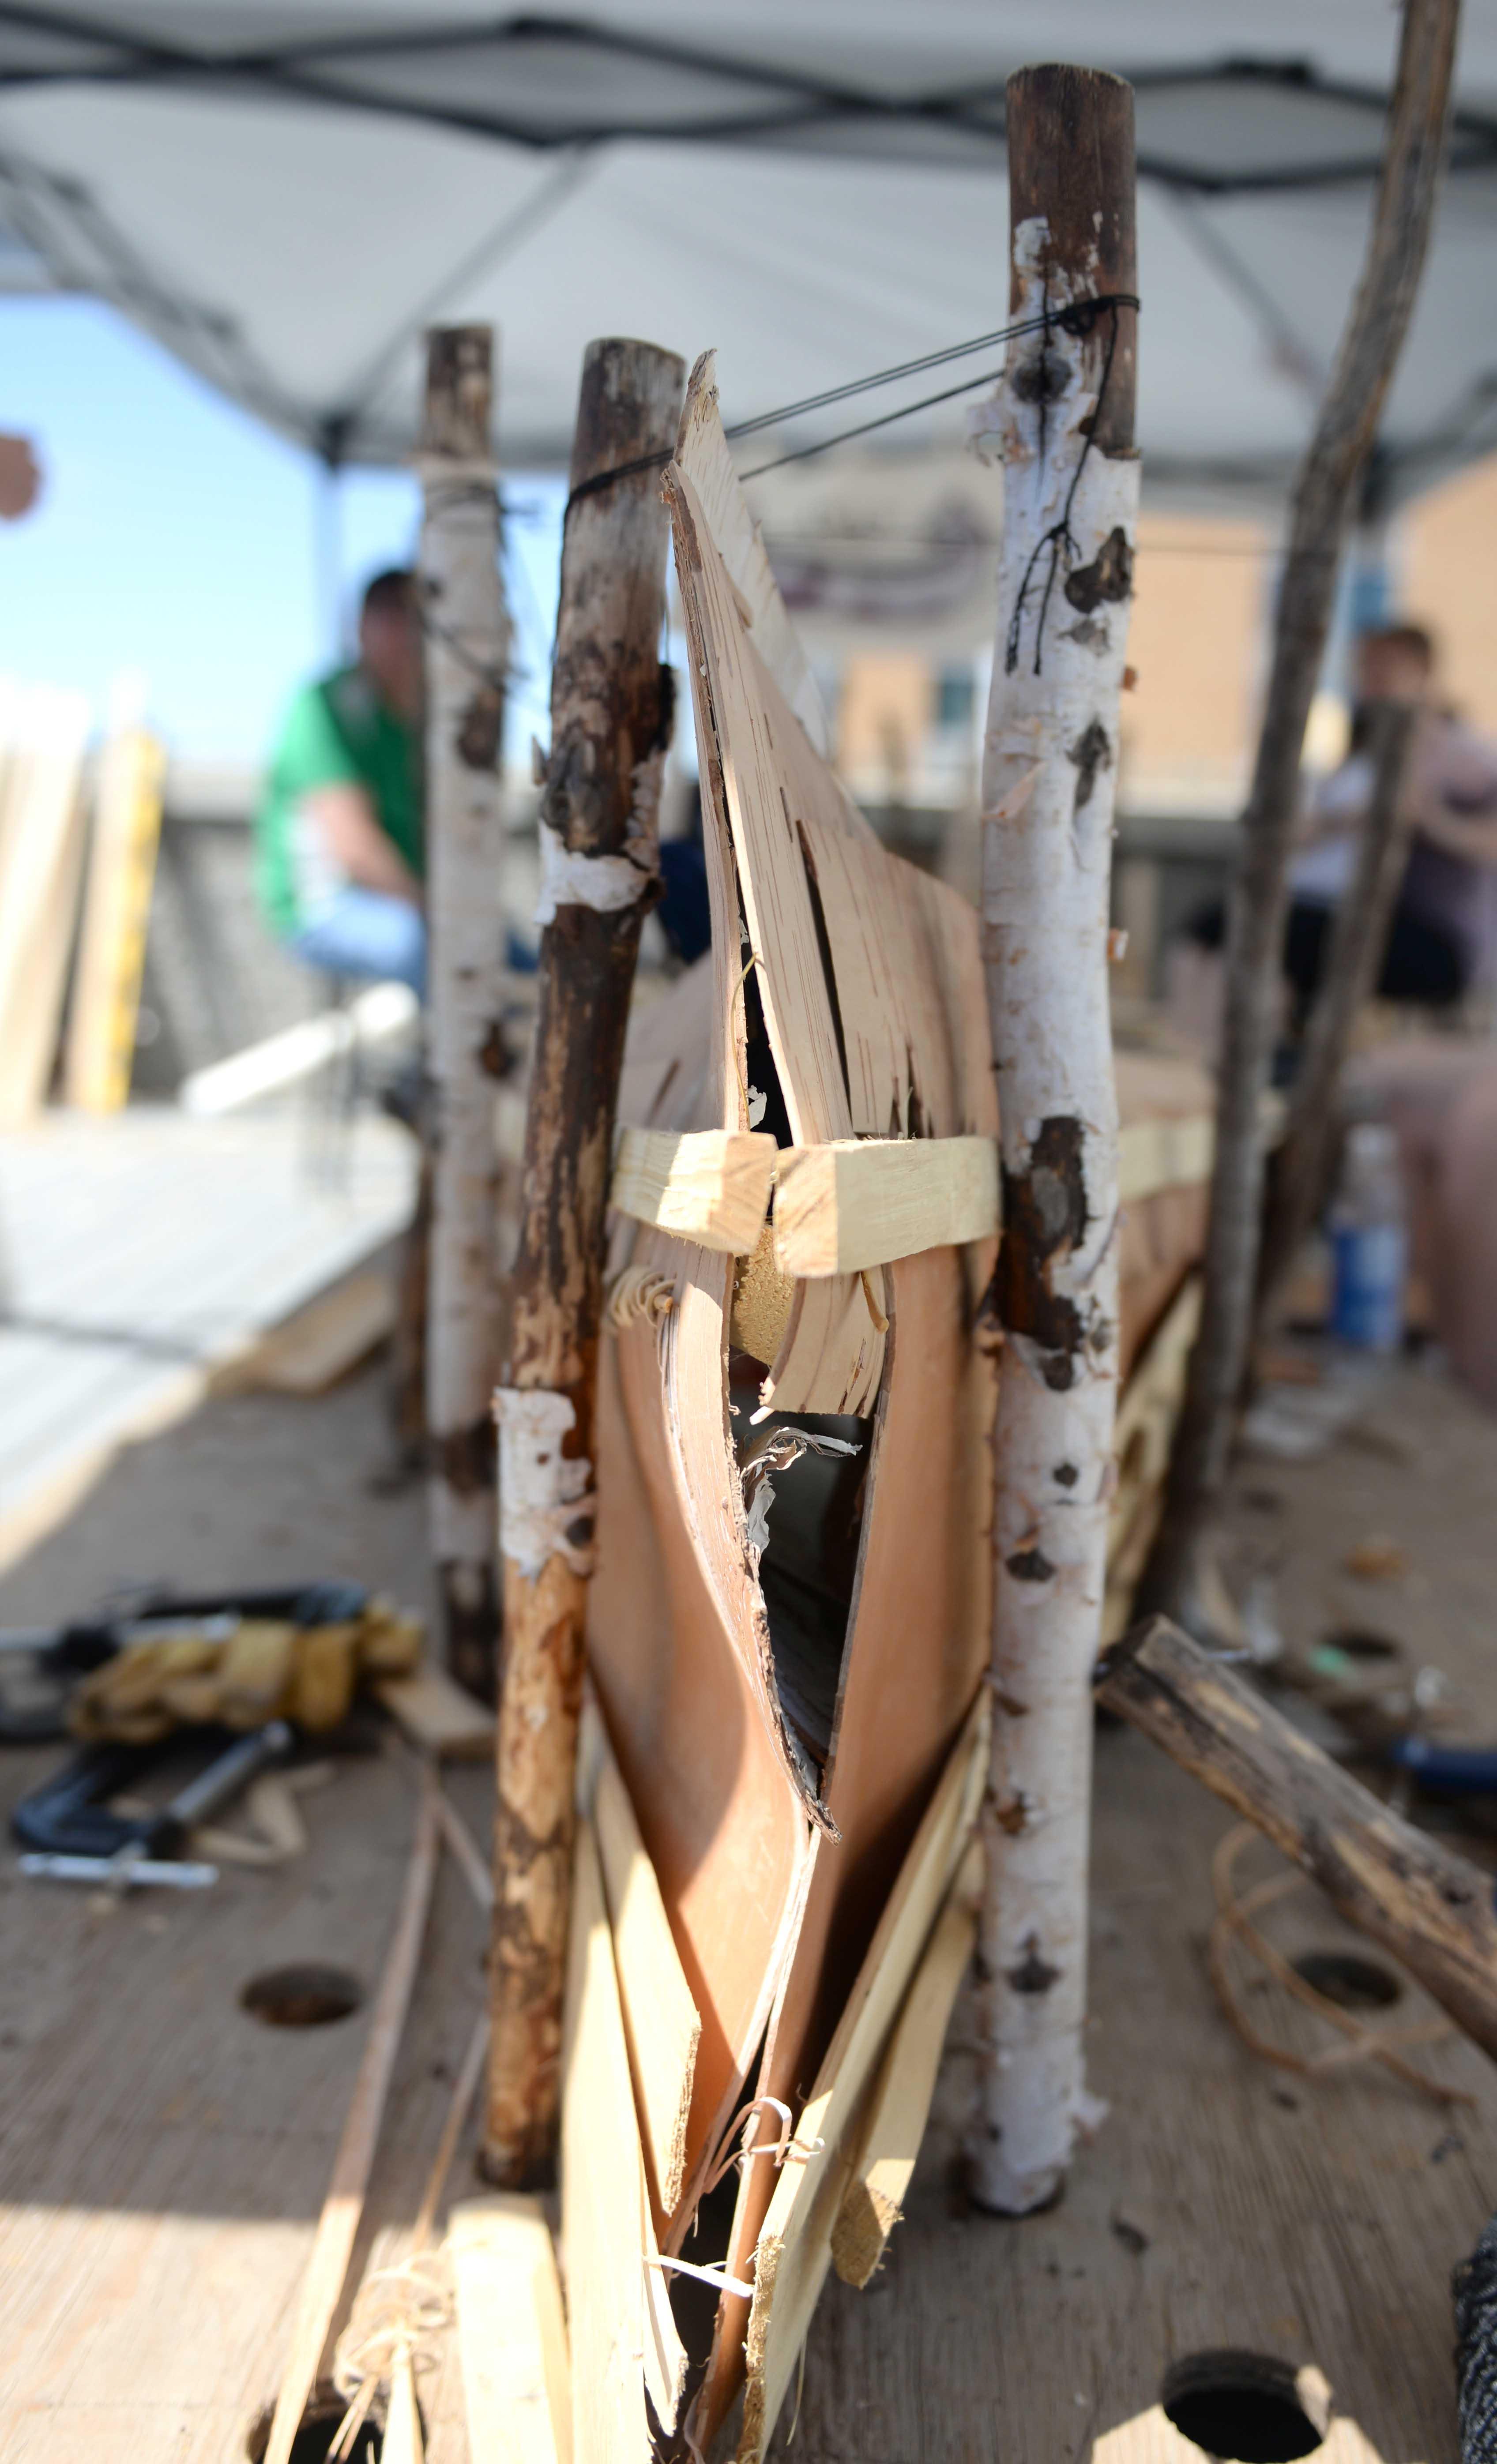 Canoe under construction